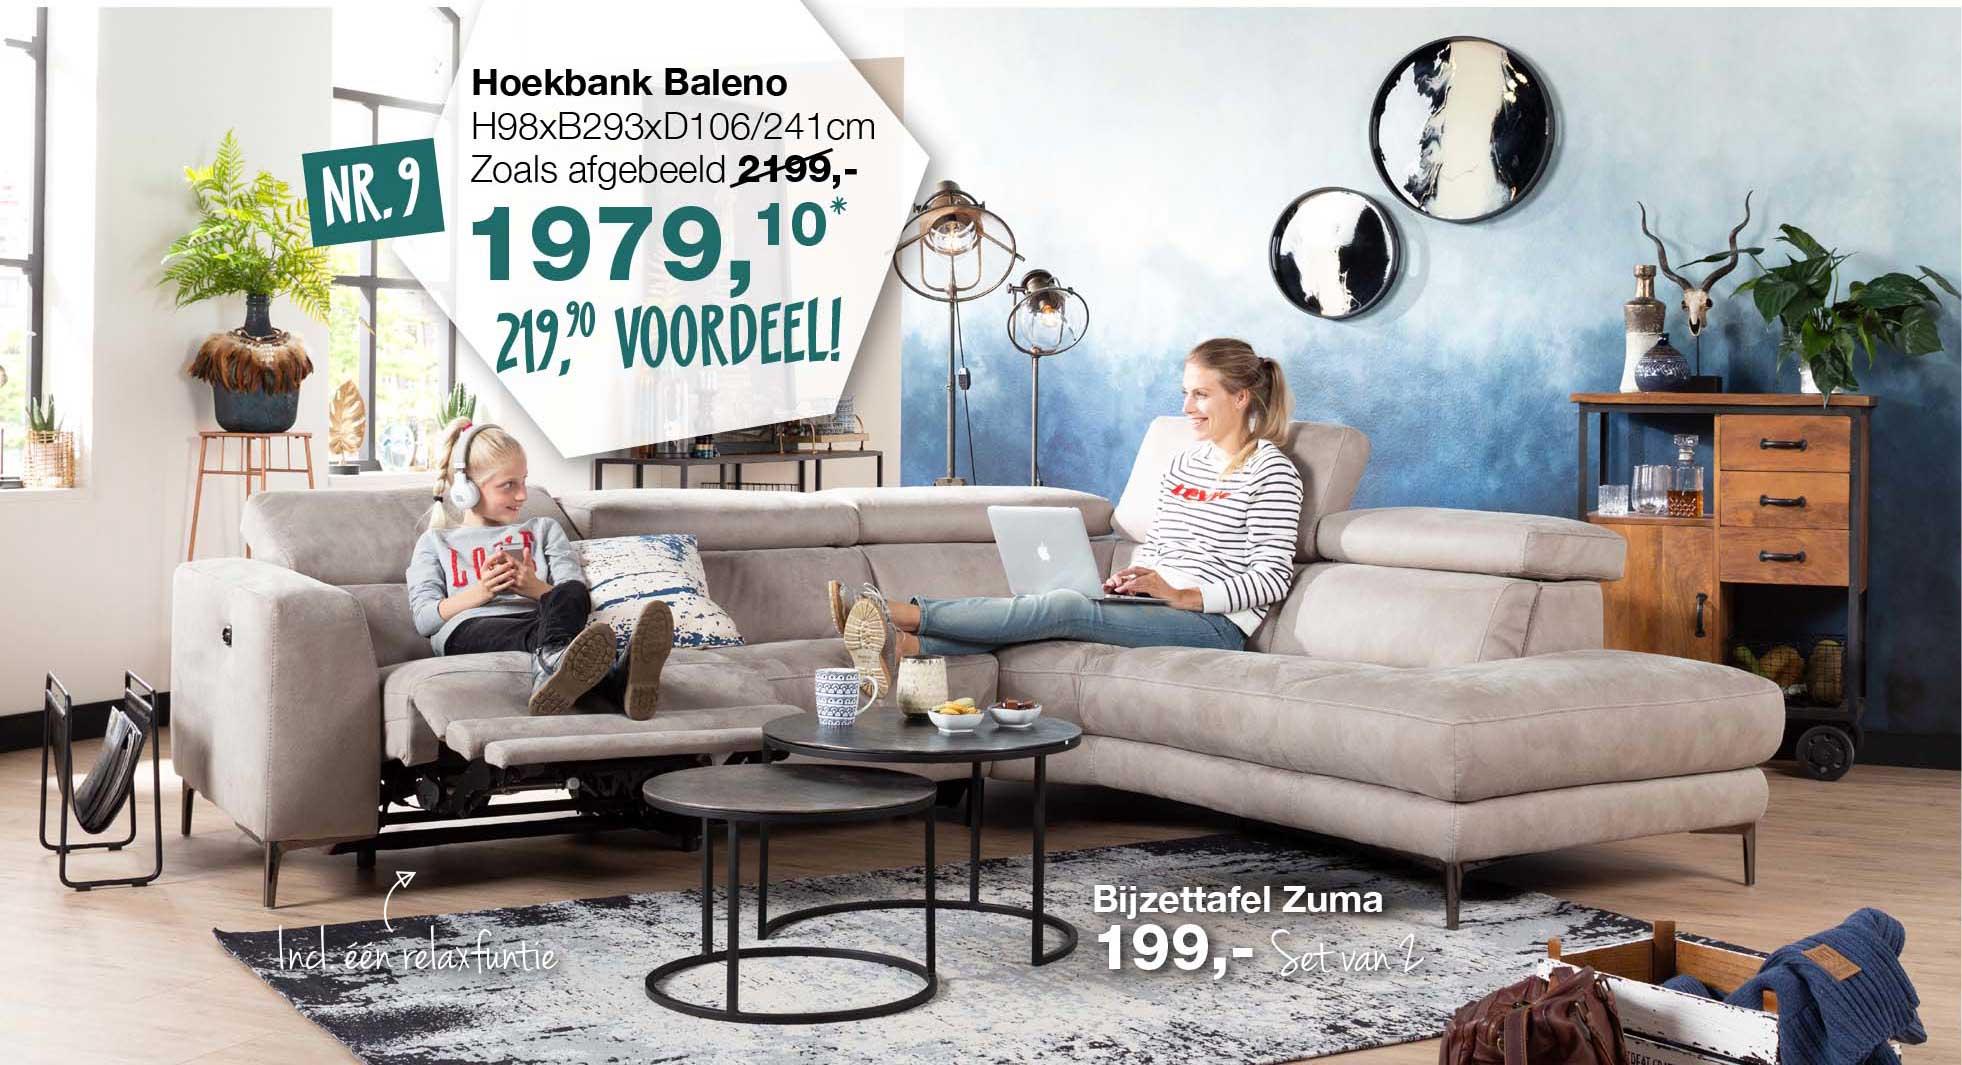 De Bommel Meubelen Hoekbank Baleno